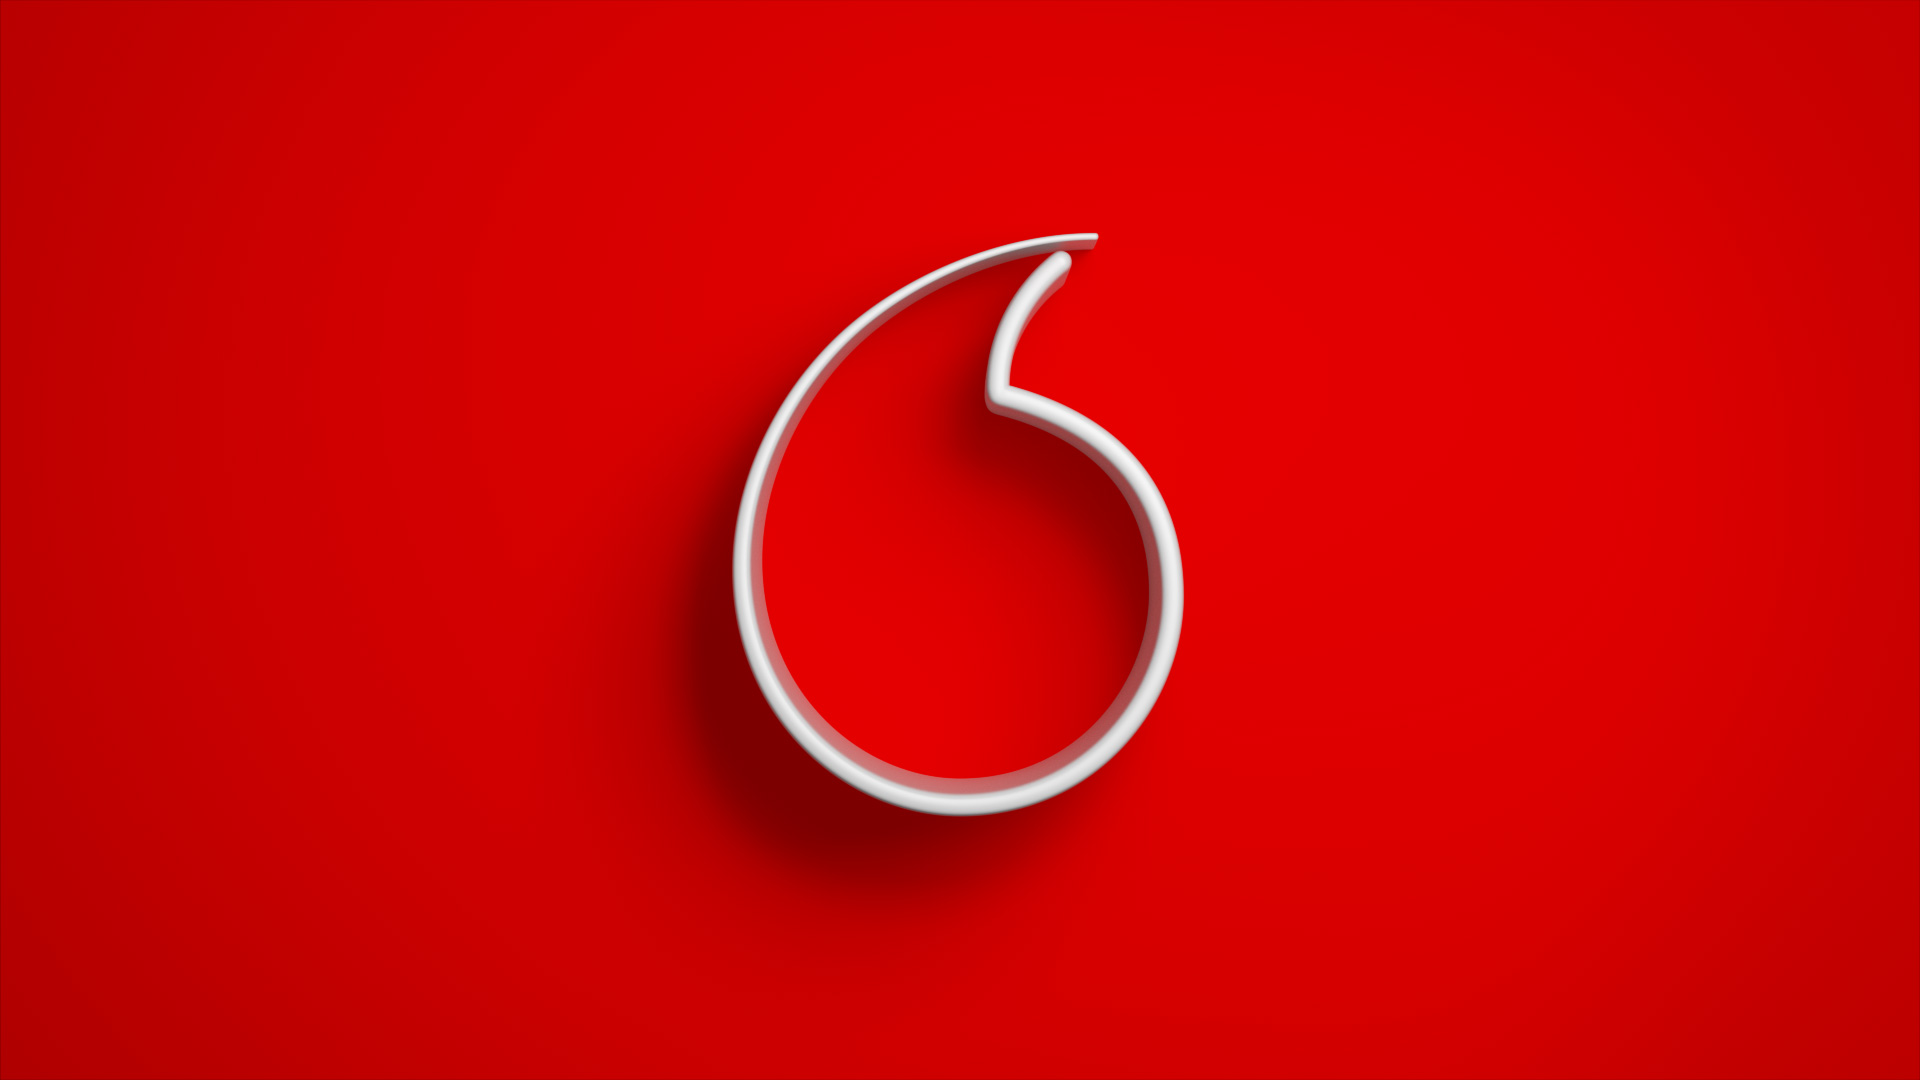 Vodafone Speechmark Red